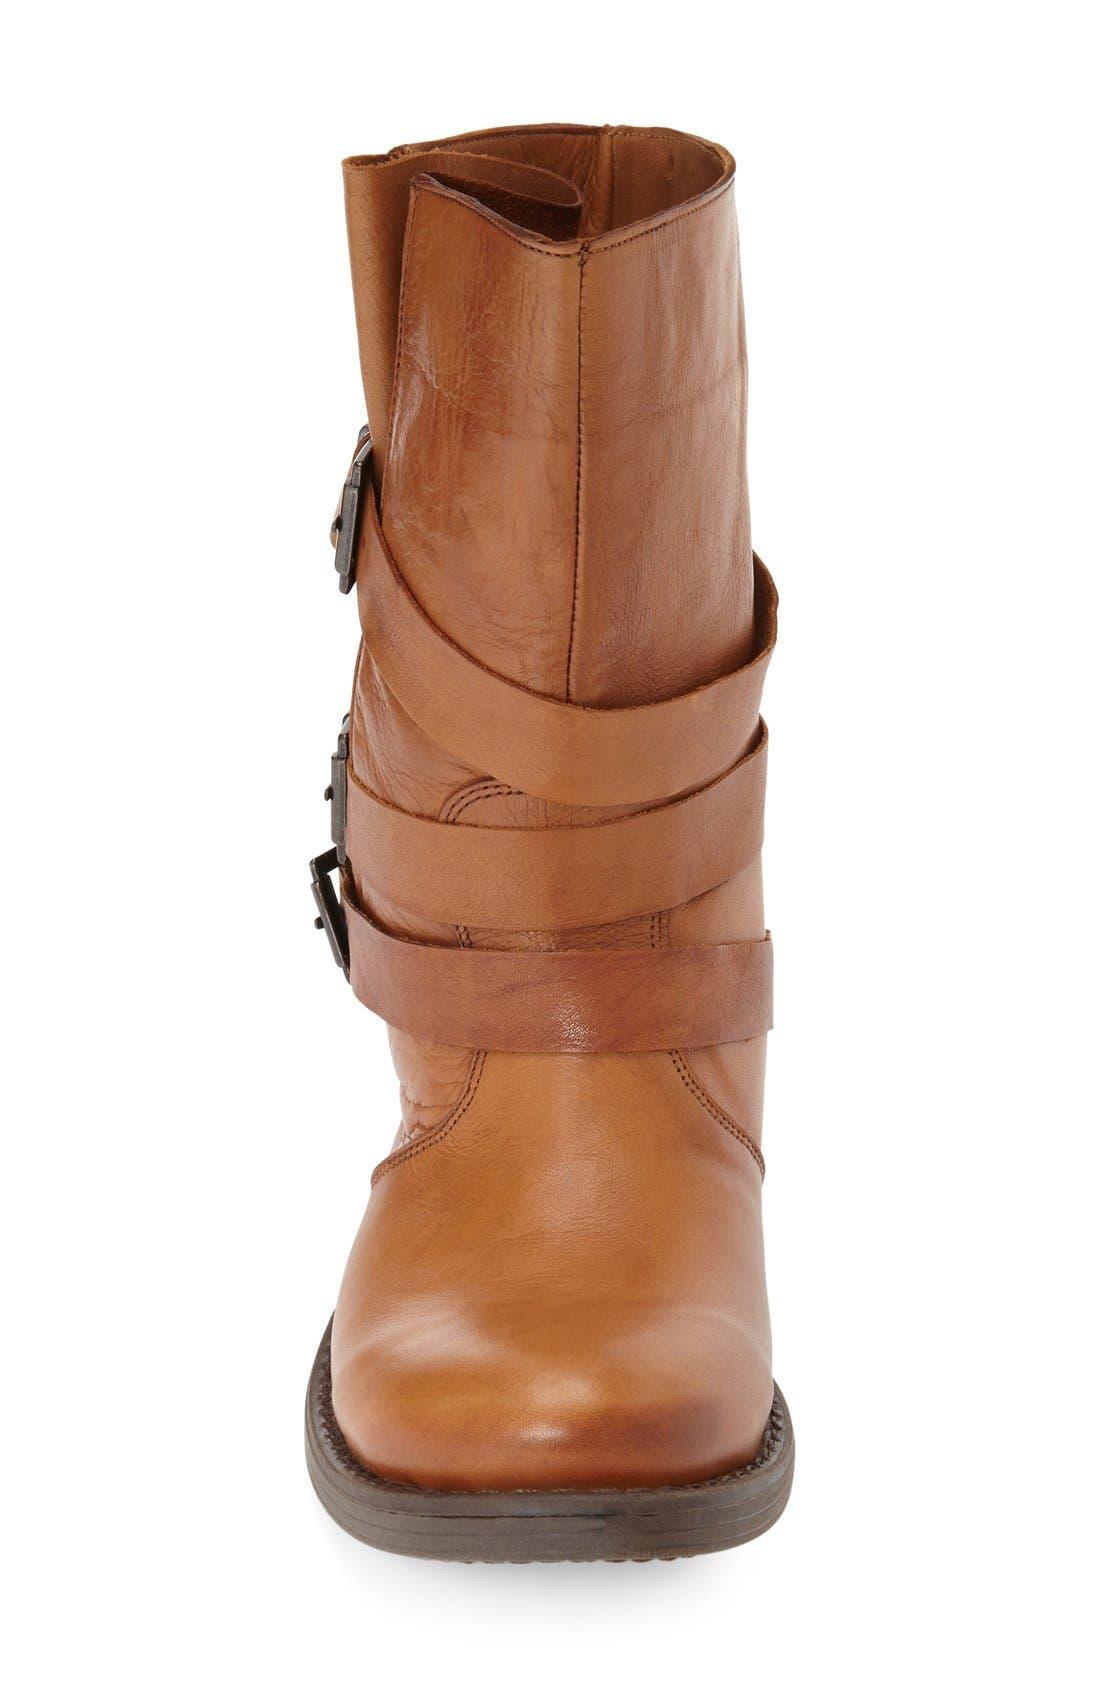 Alternate Image 3  - Miz Mooz 'Clang' Leather Moto Bootie (Women)